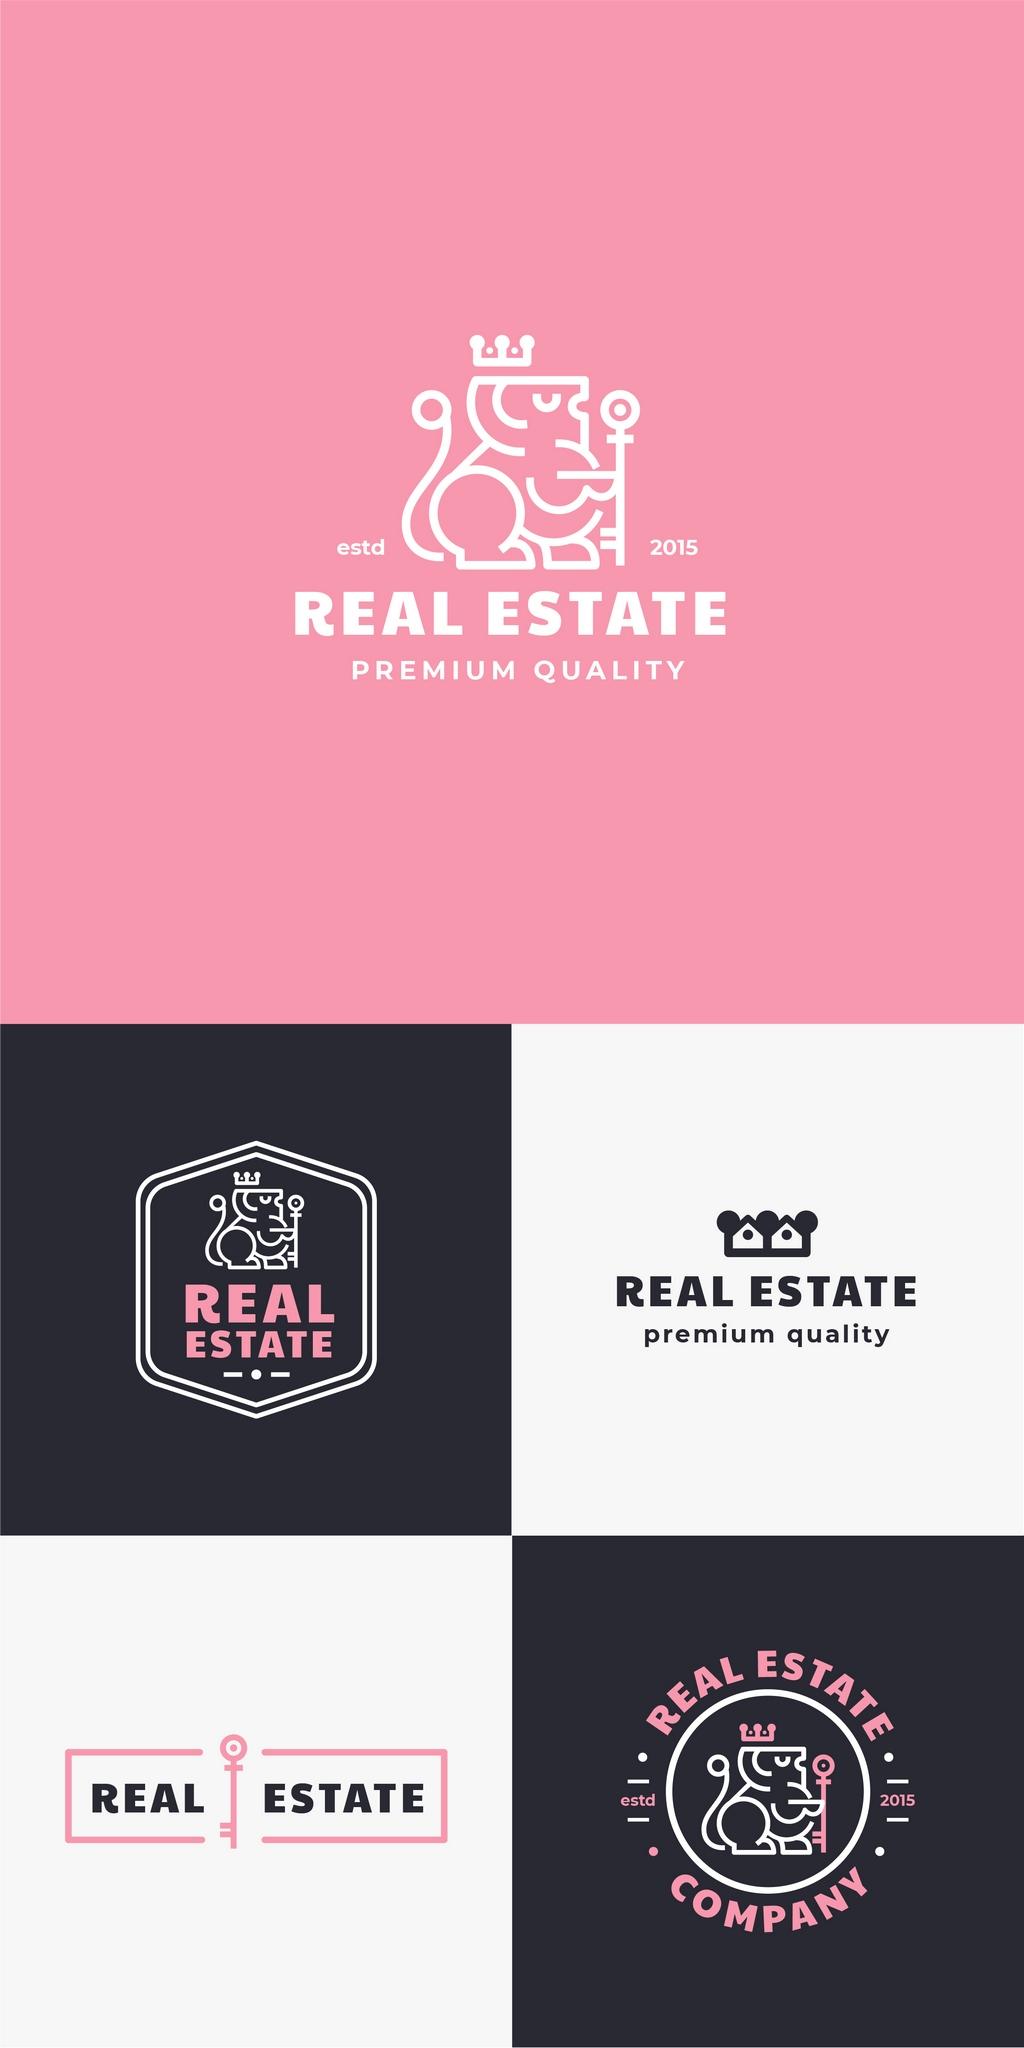 logo & brand identity pack screenshot 5